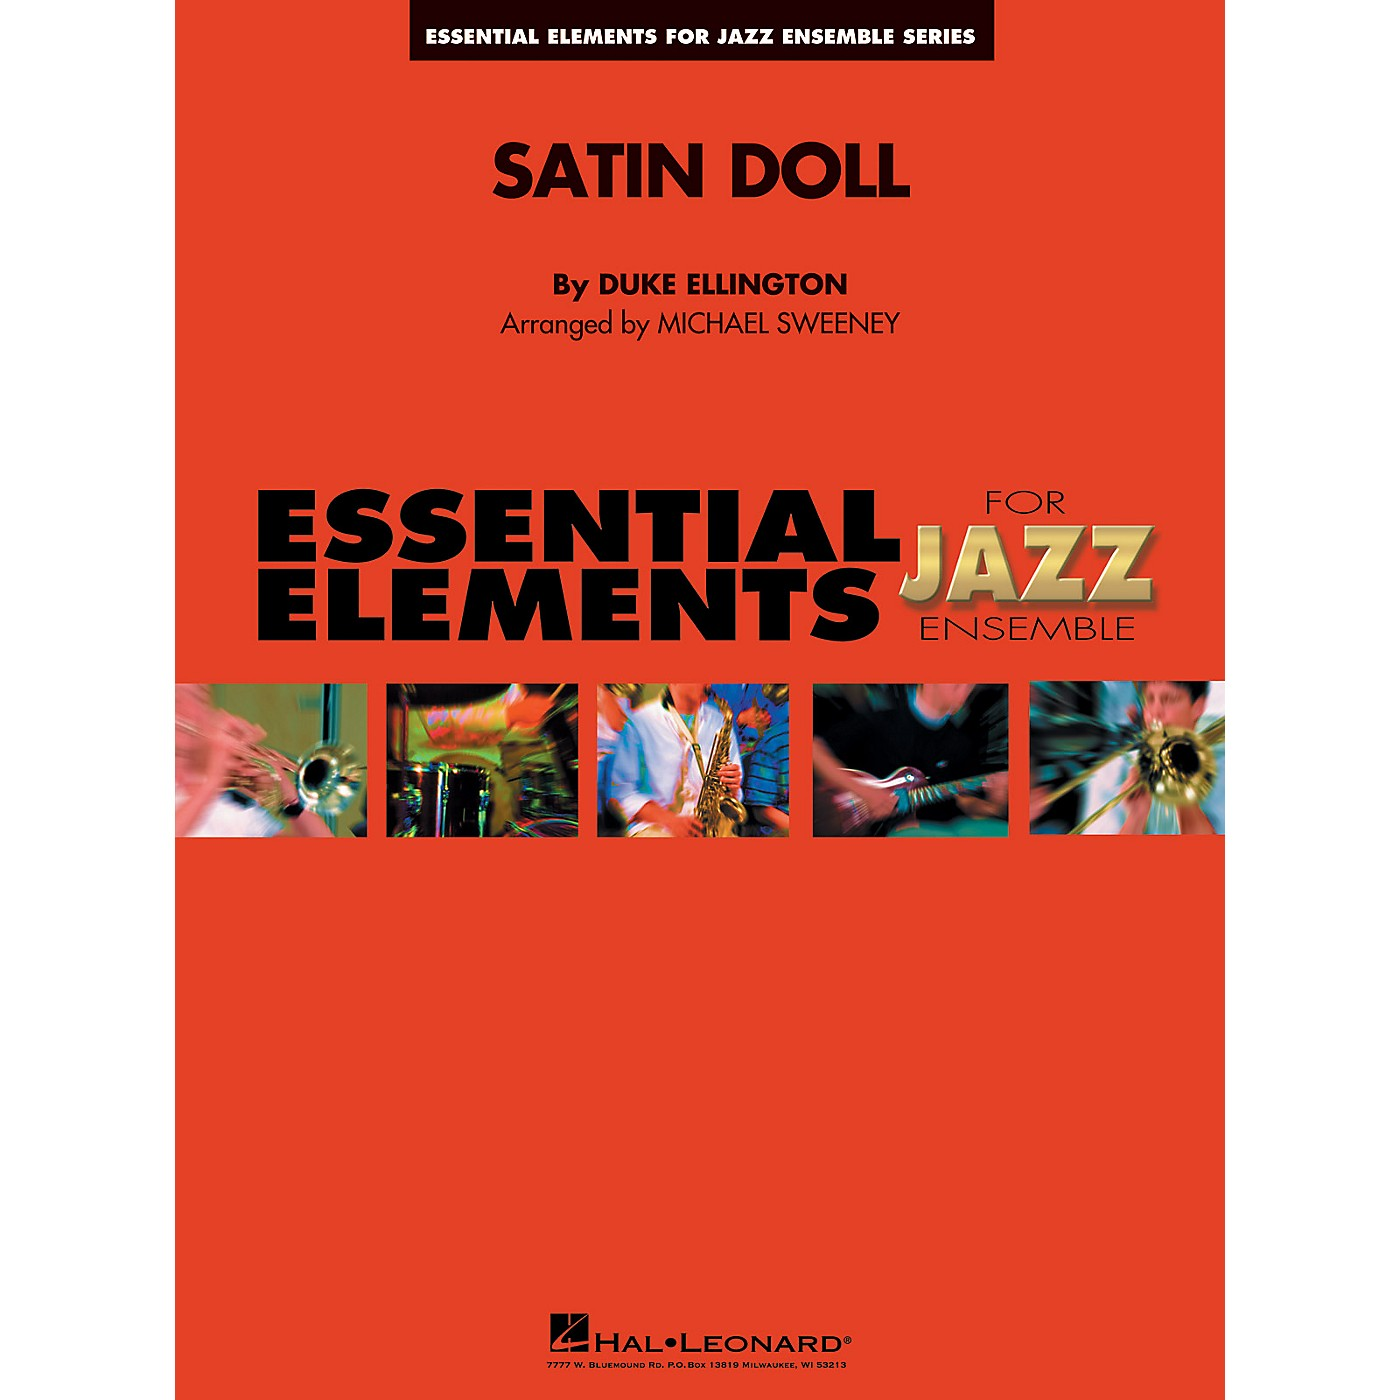 Hal Leonard Satin Doll Jazz Band Level 1-2 Arranged by Michael Sweeney thumbnail